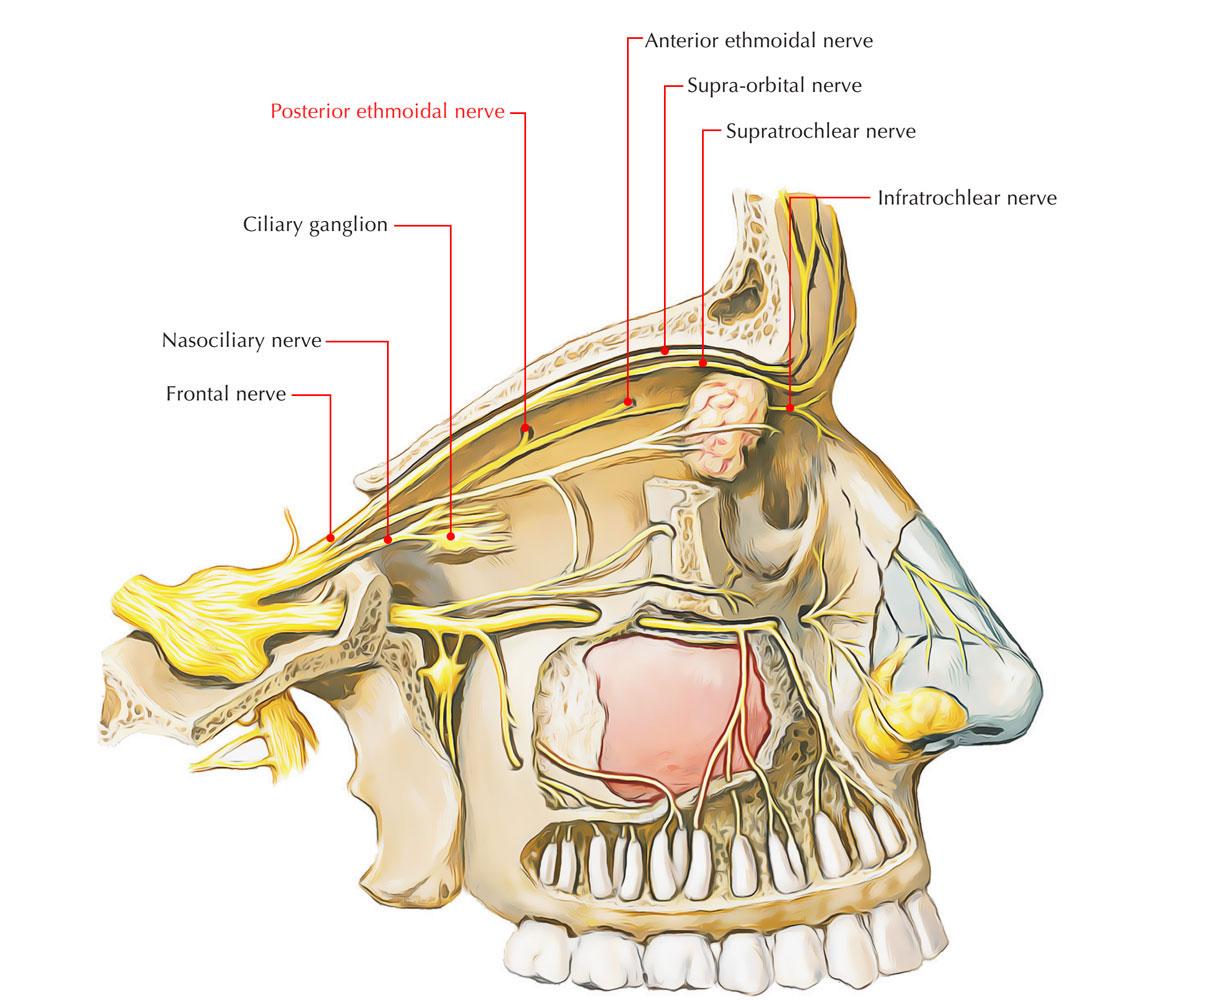 Posterior Ethmoidal Nerve